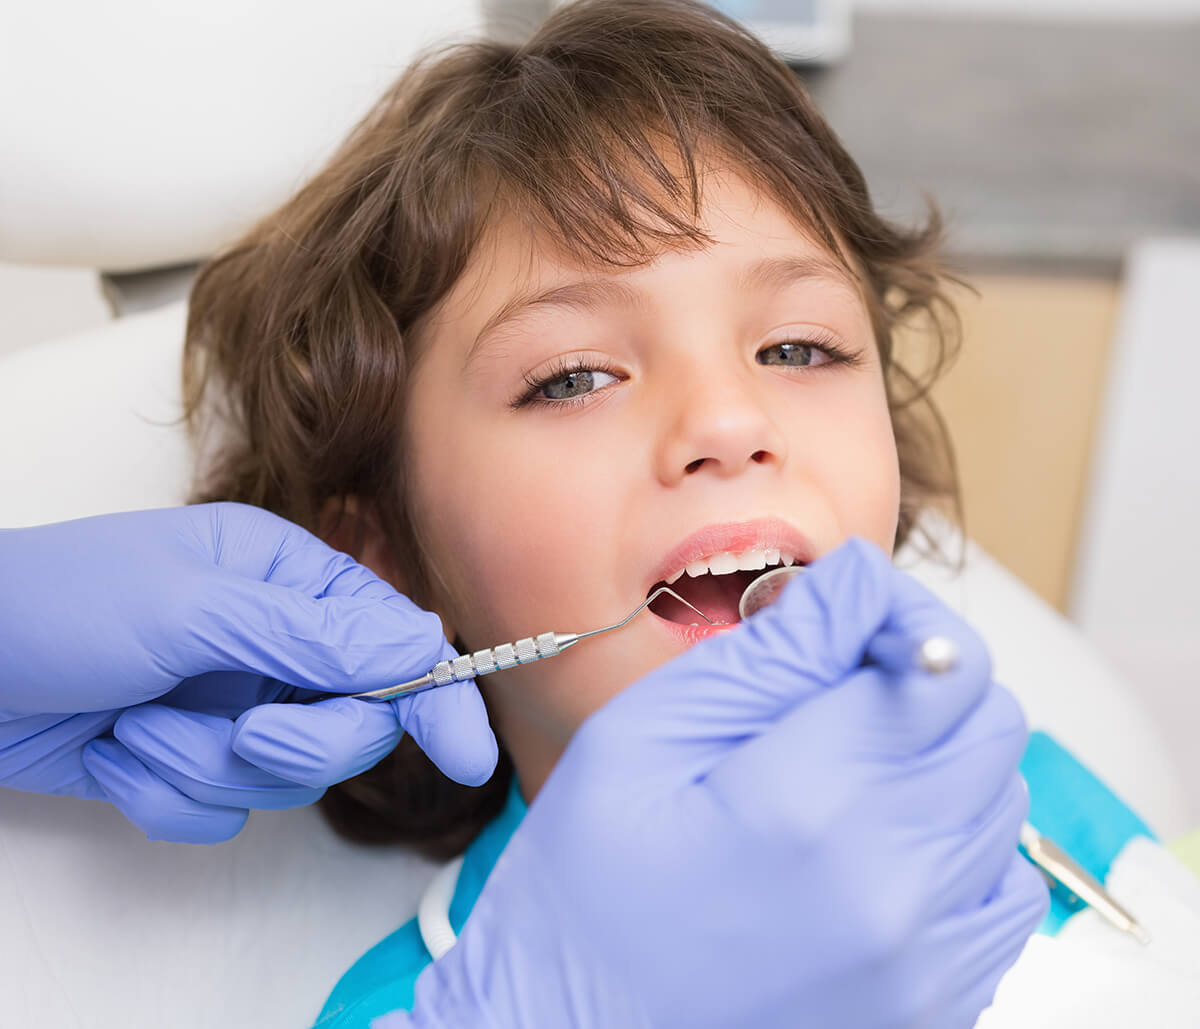 Virtue Dental Care Yadkinville NC, The Newest Dental Technology in Pediatric Dentistry in Yadkinville, NC